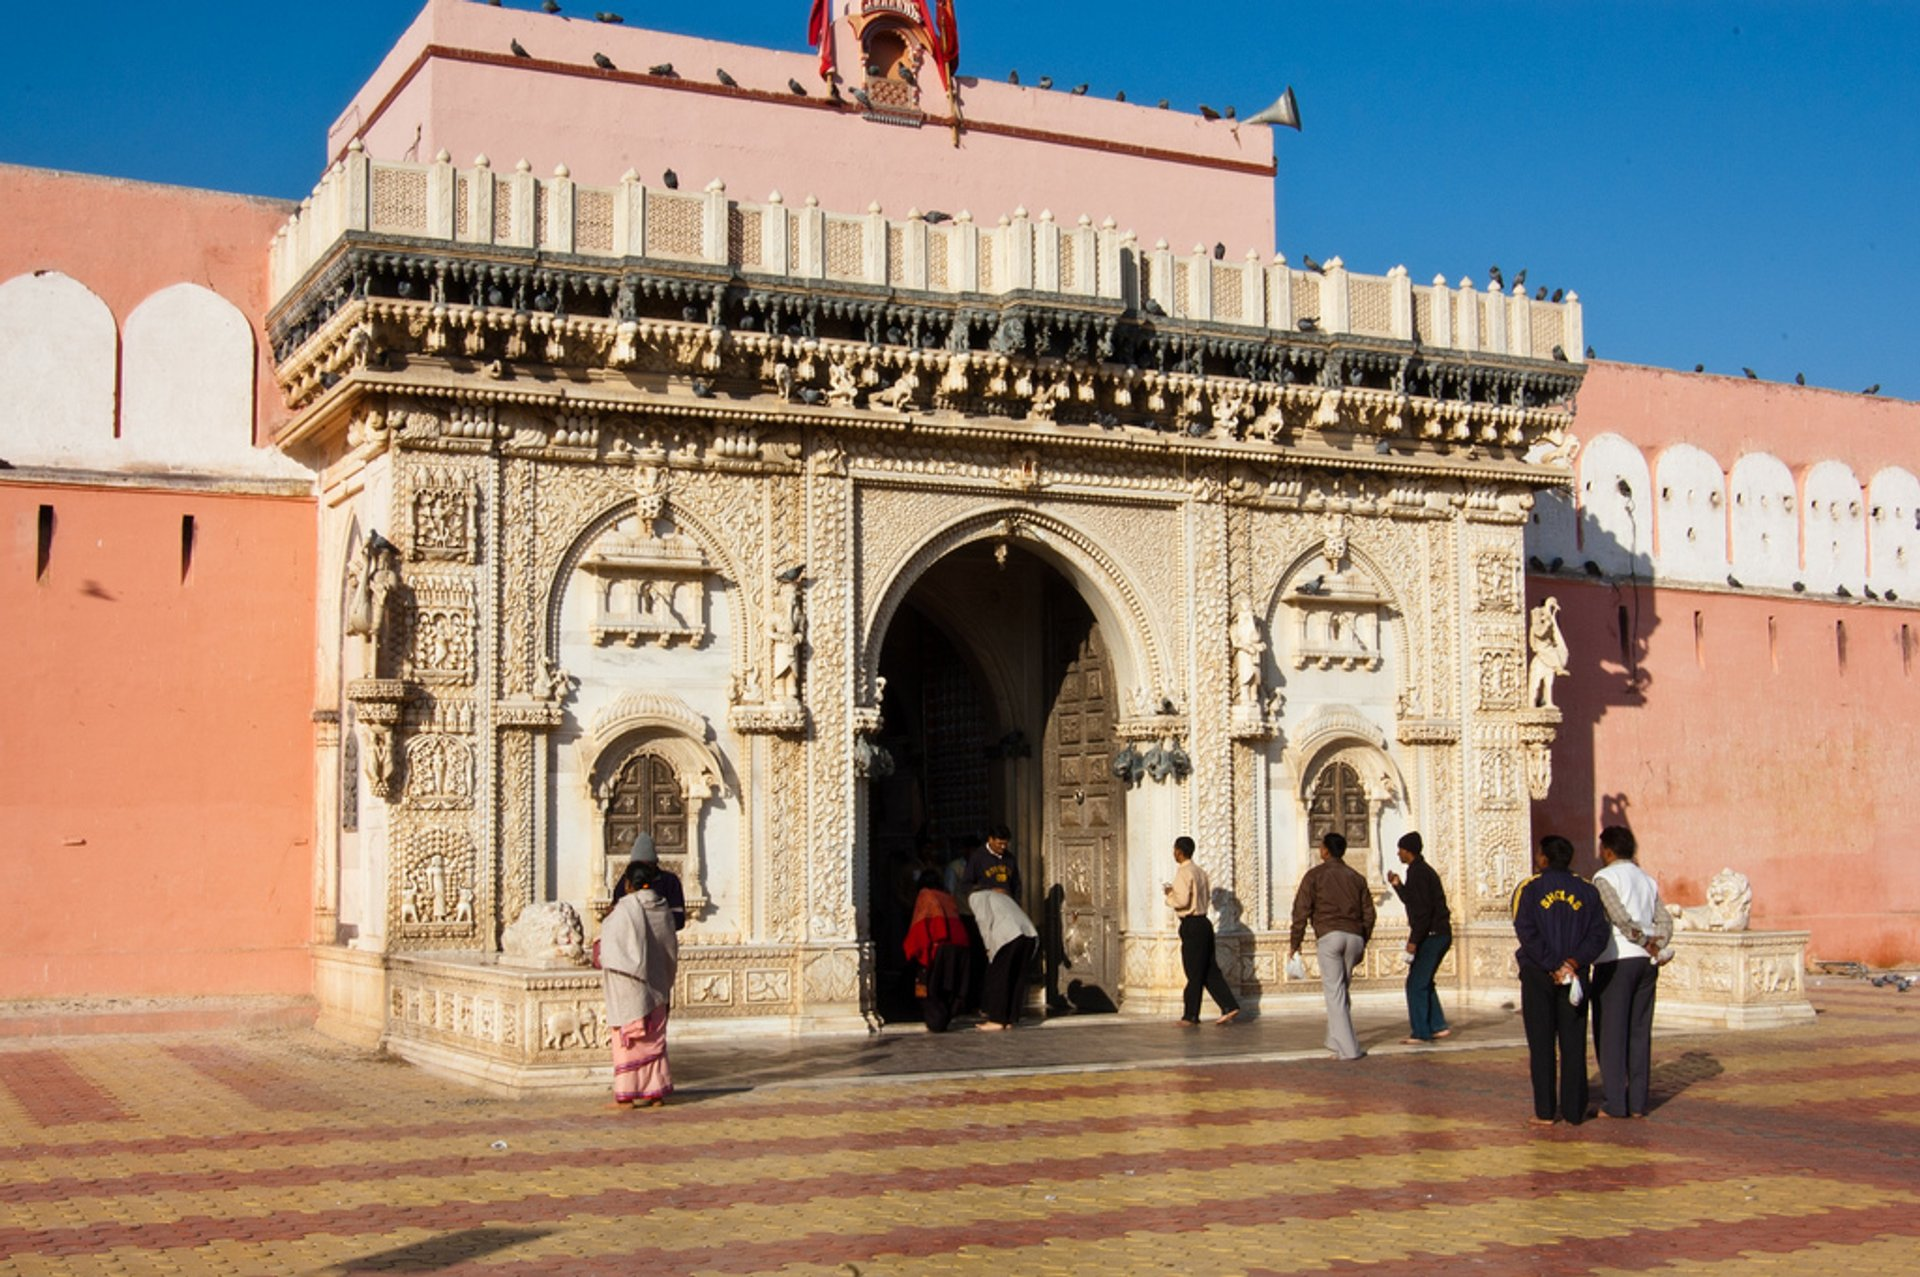 Entrance to Karni Mata Temple 2020